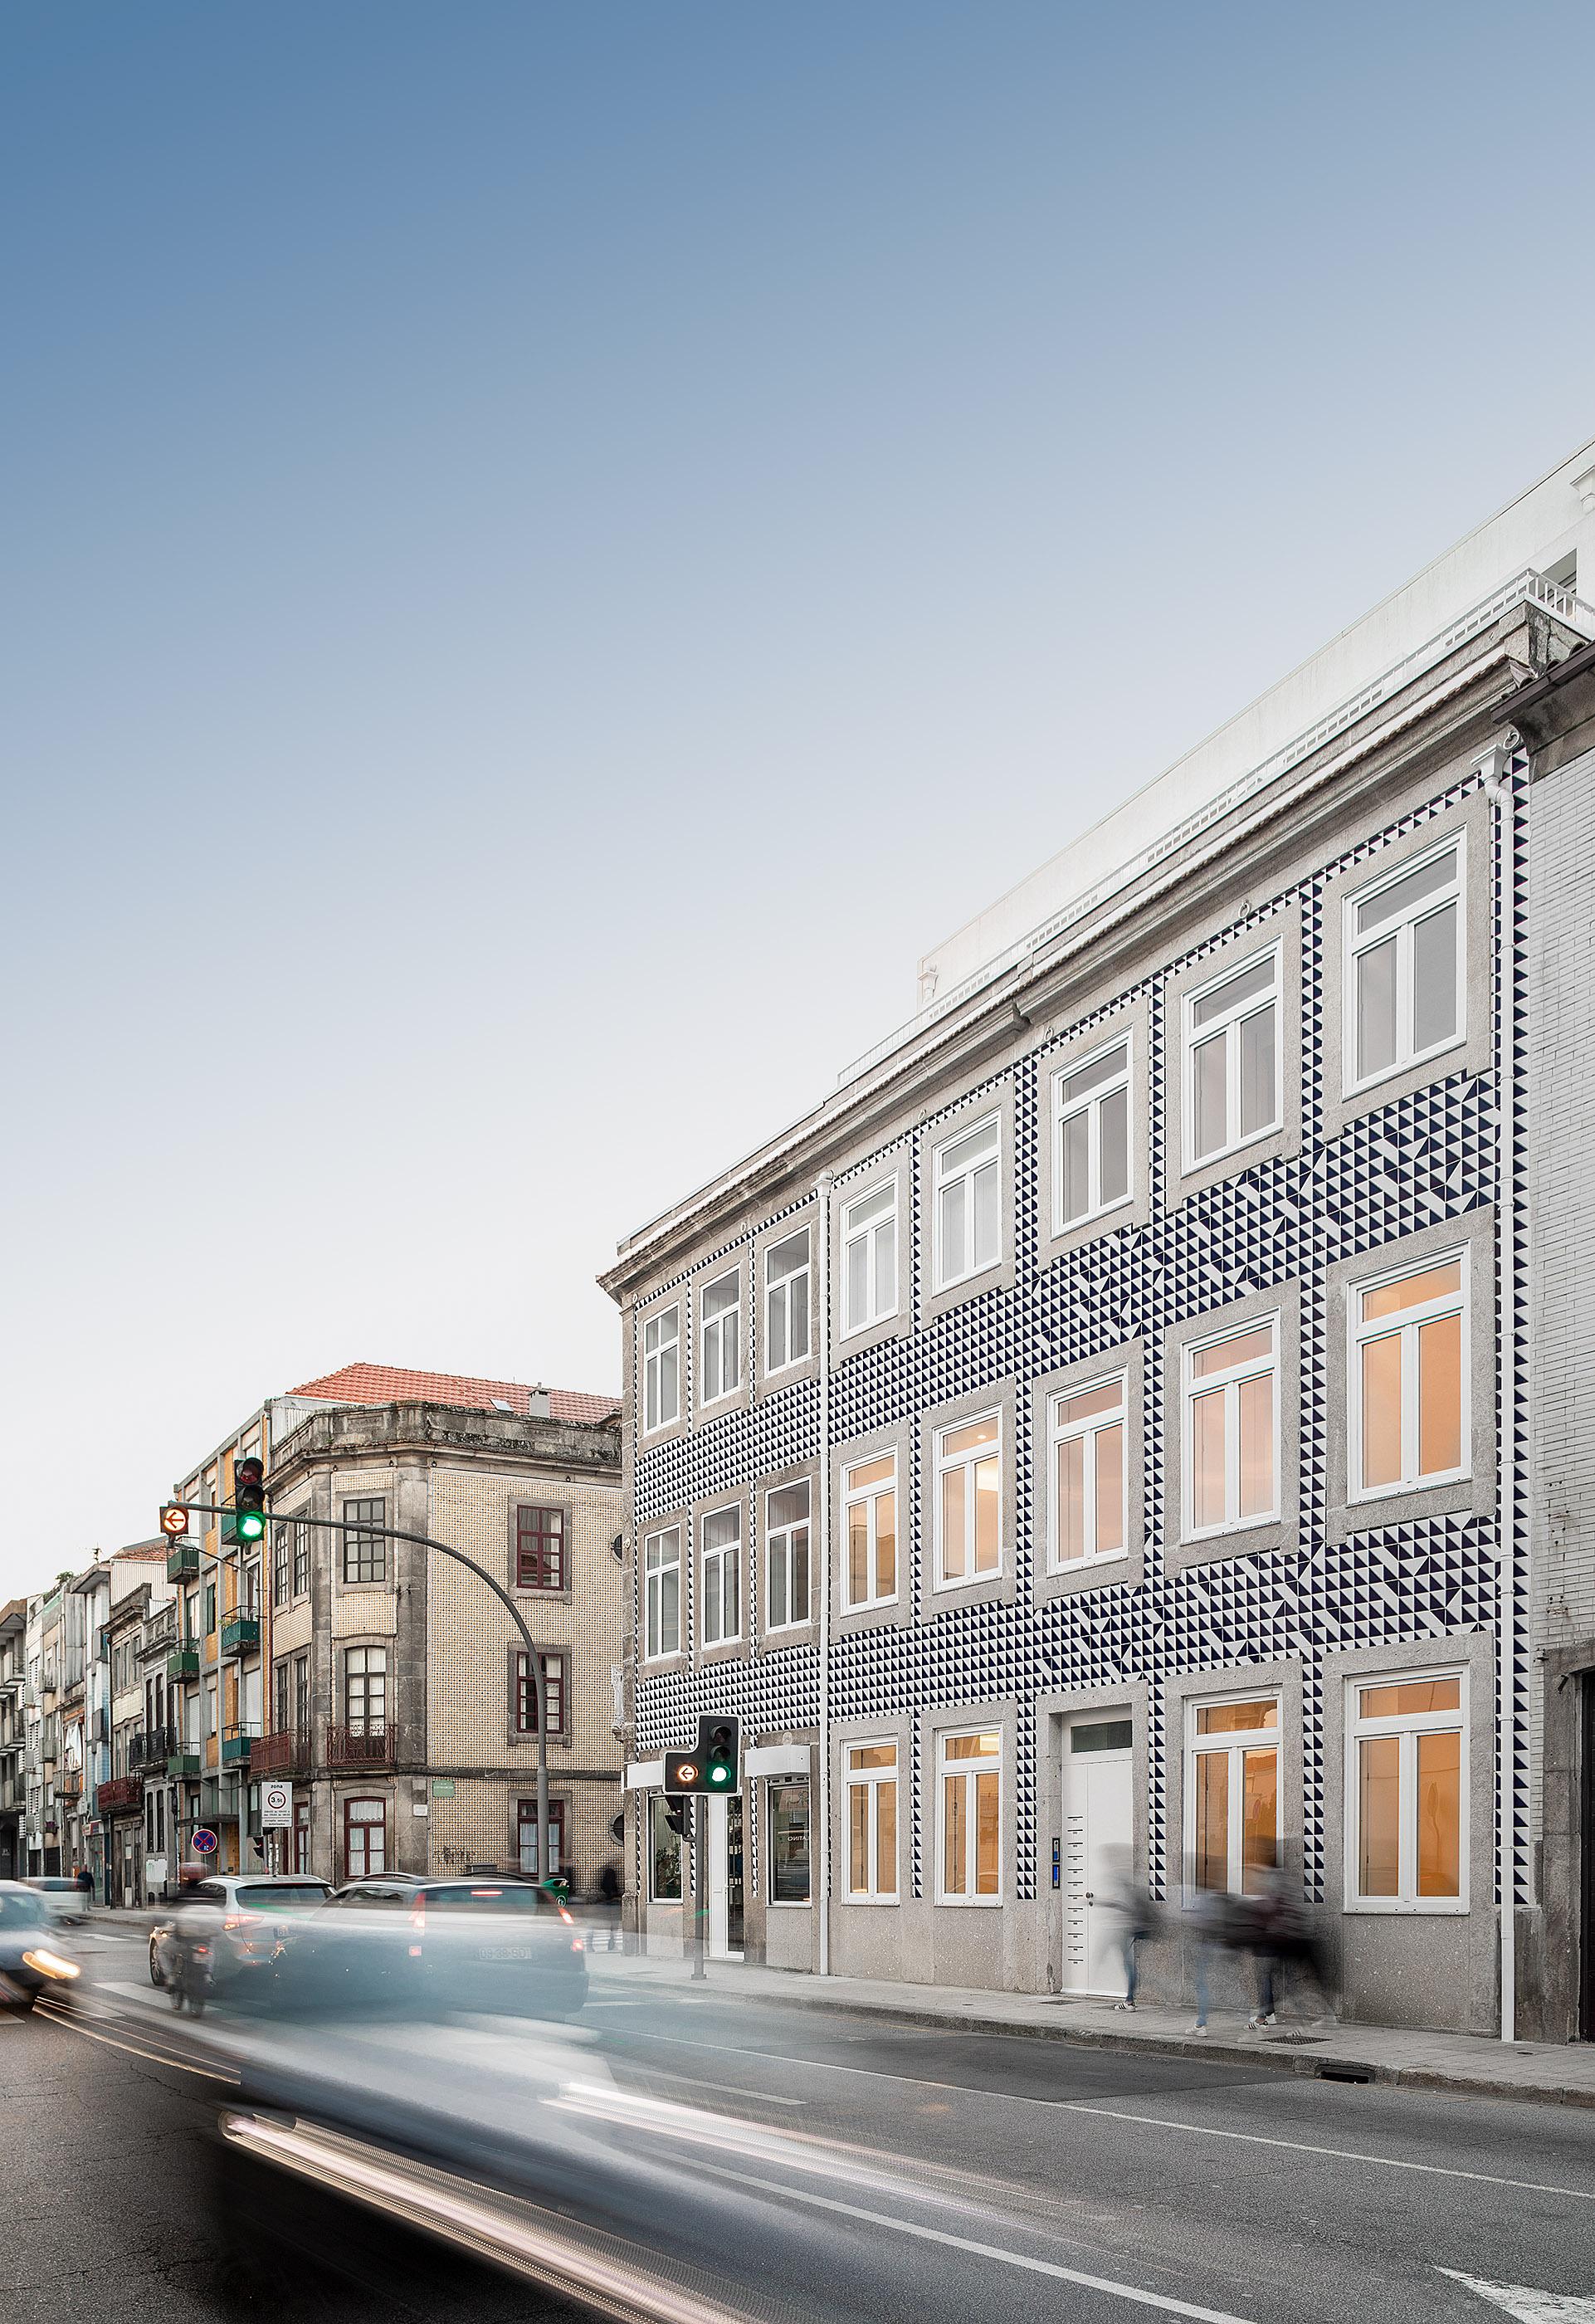 20190315 Mimool Rua Da Alegria 81 do fotografo Ivo Tavares Studio